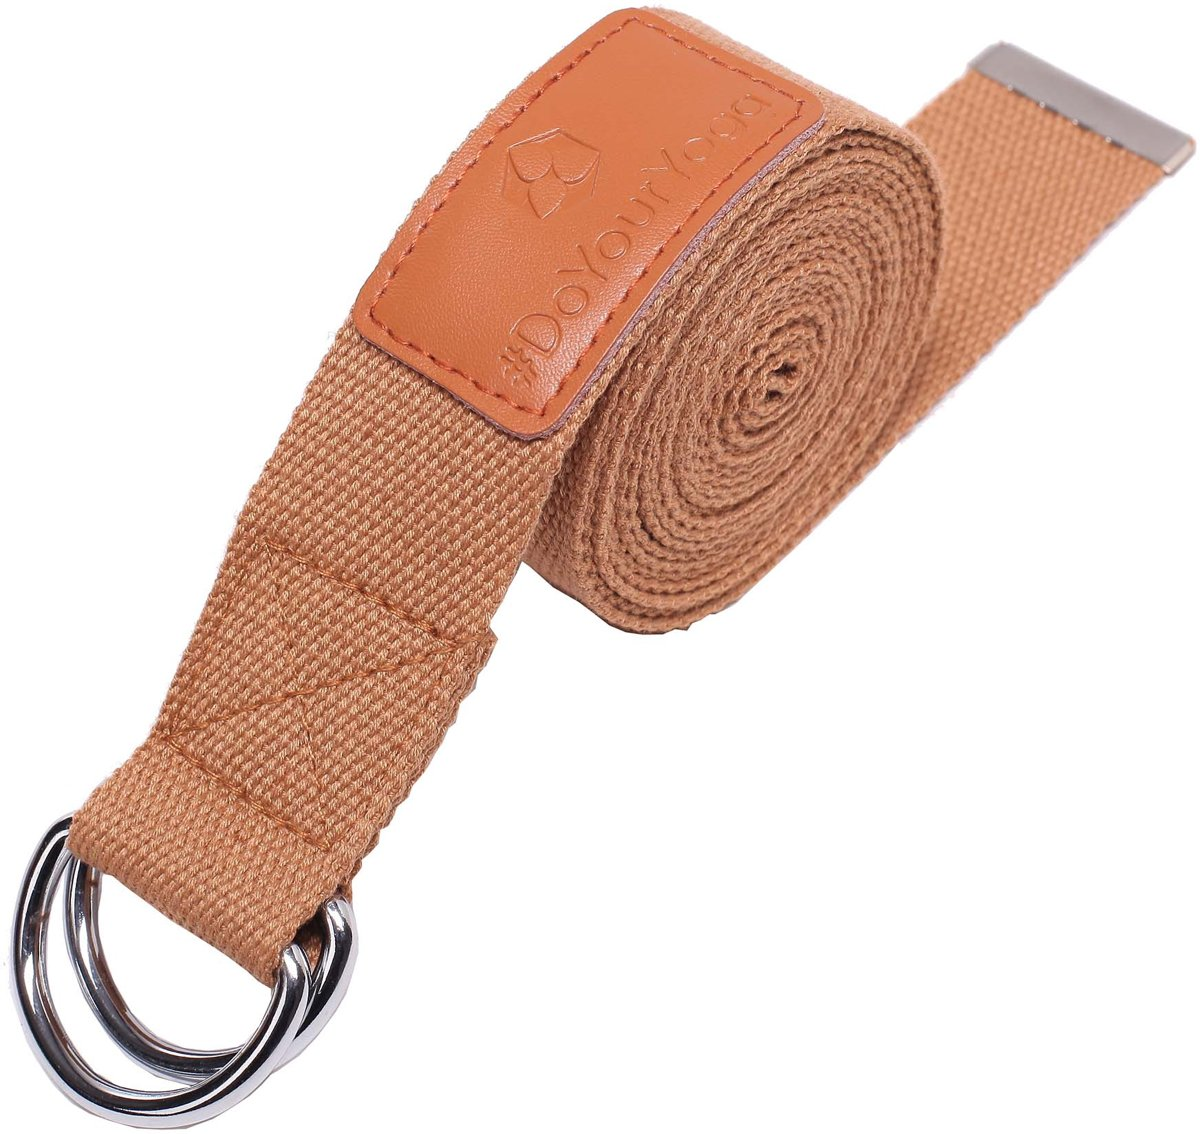 #DoYourYoga - Yogariem - »Mathadi« - 100% polyester met stabiele metalen ringsluiting - 300 x 3,8 cm - Huidskleur kopen